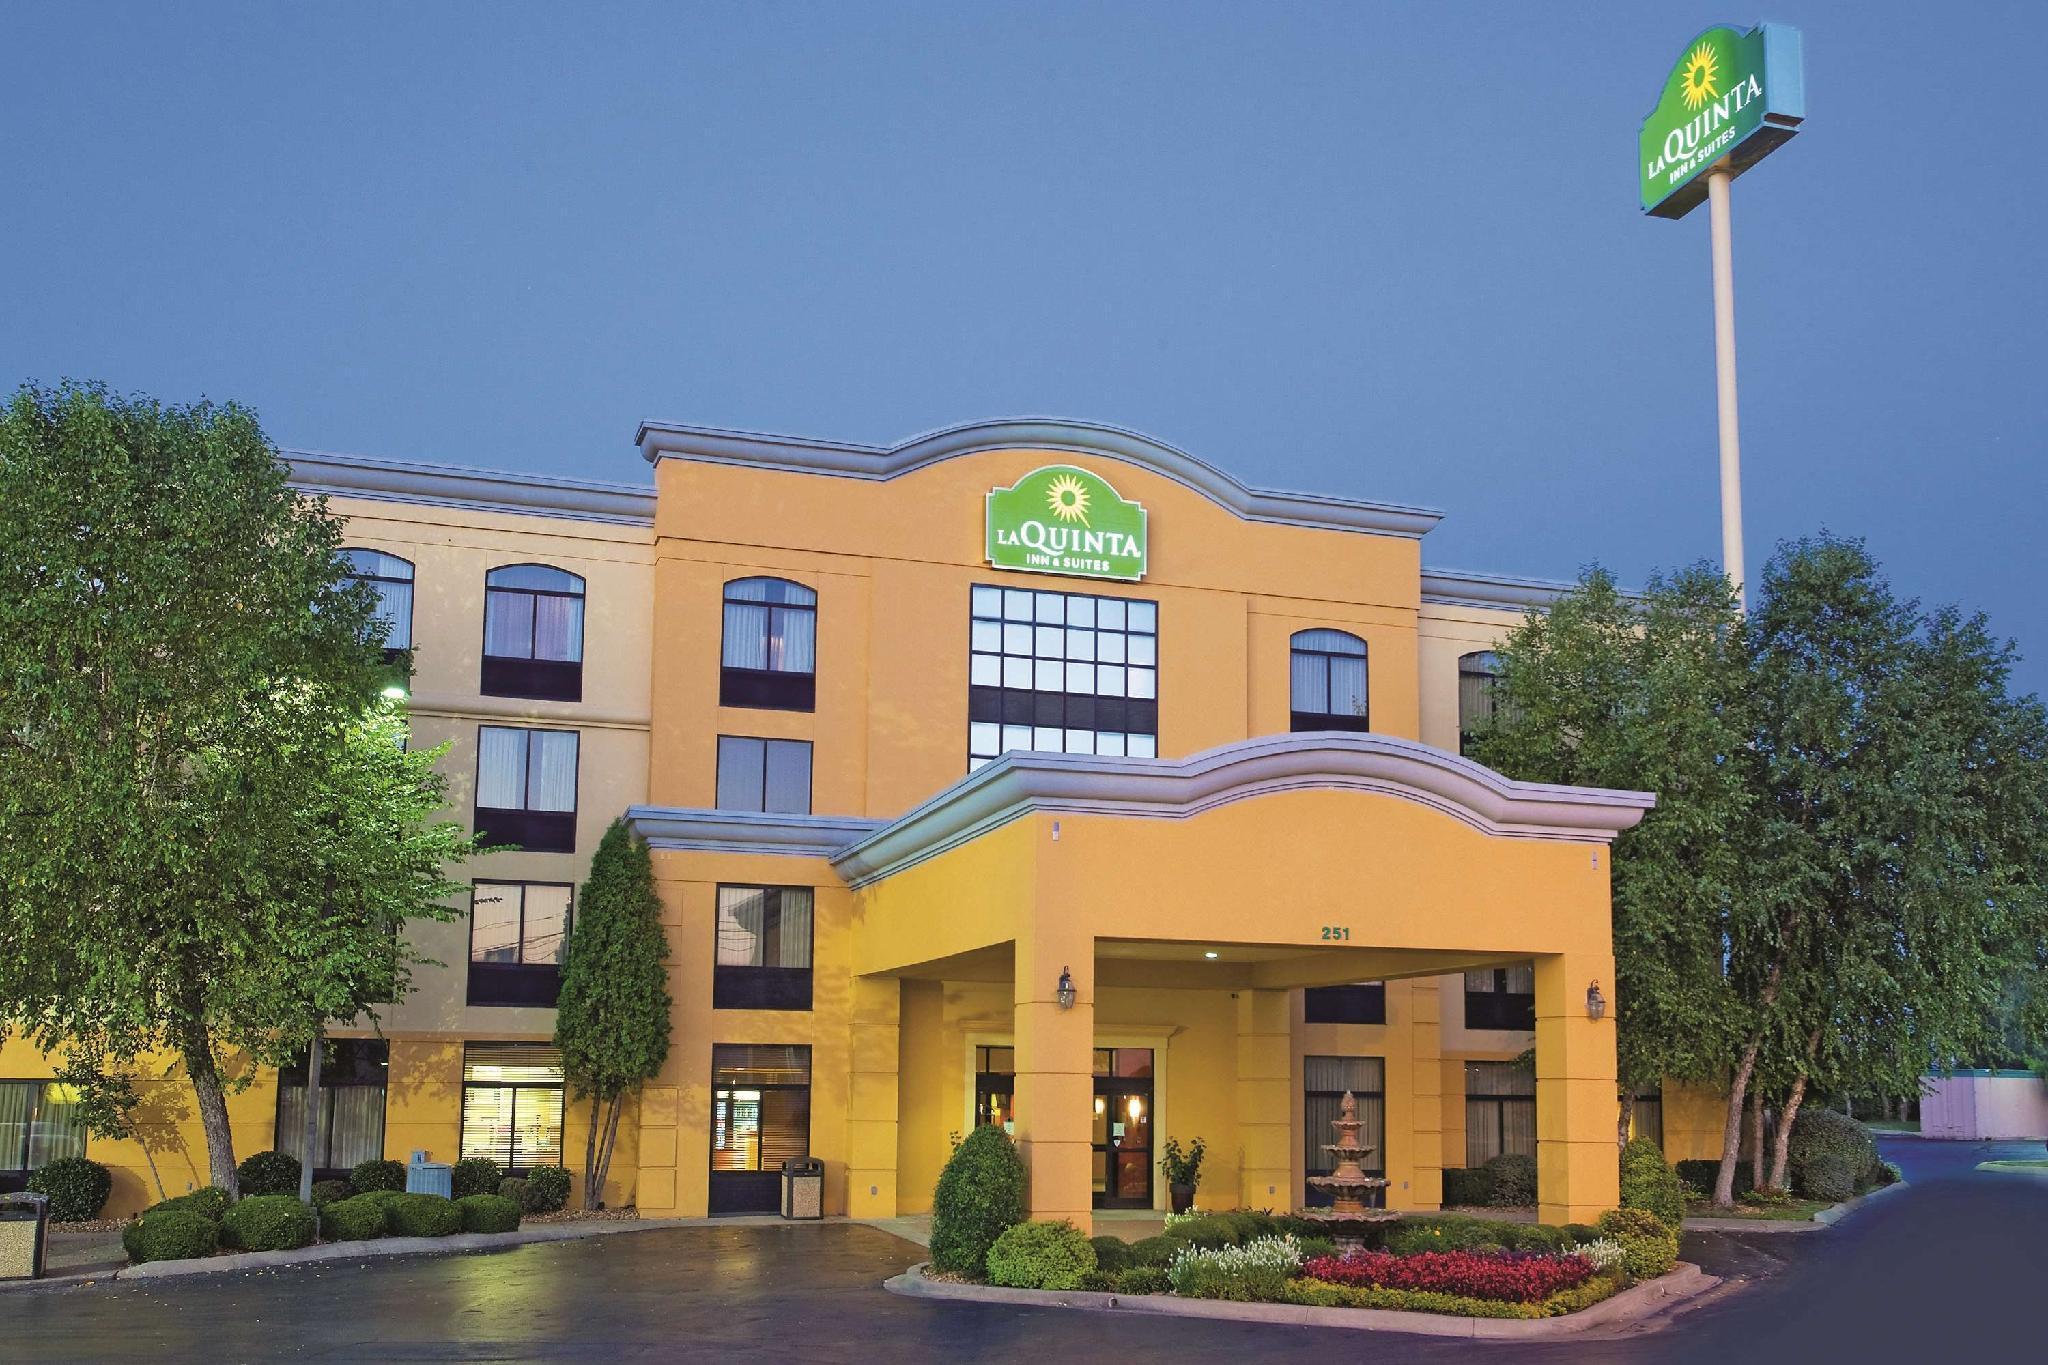 La Quinta Inn And Suites By Wyndham Clarksville